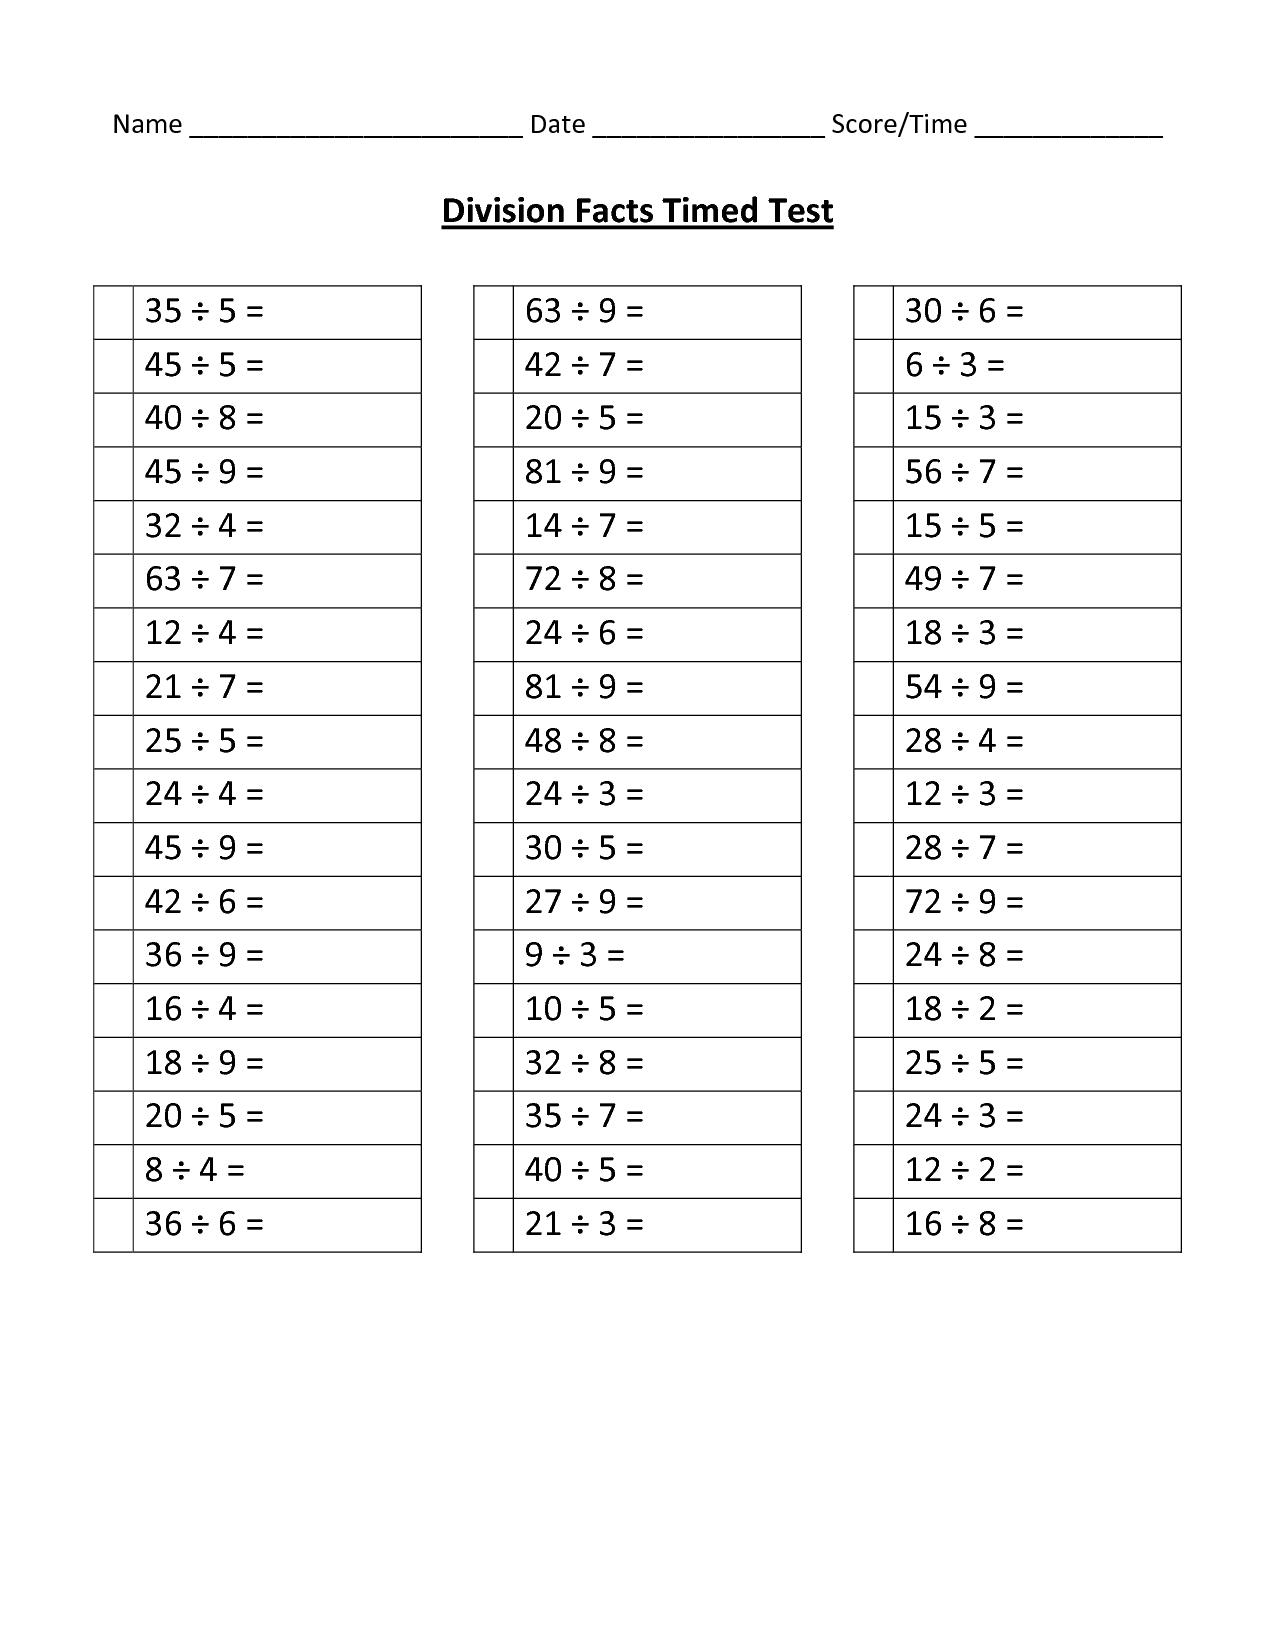 14 Best Images Of 100 Division Facts Timed Test Worksheet